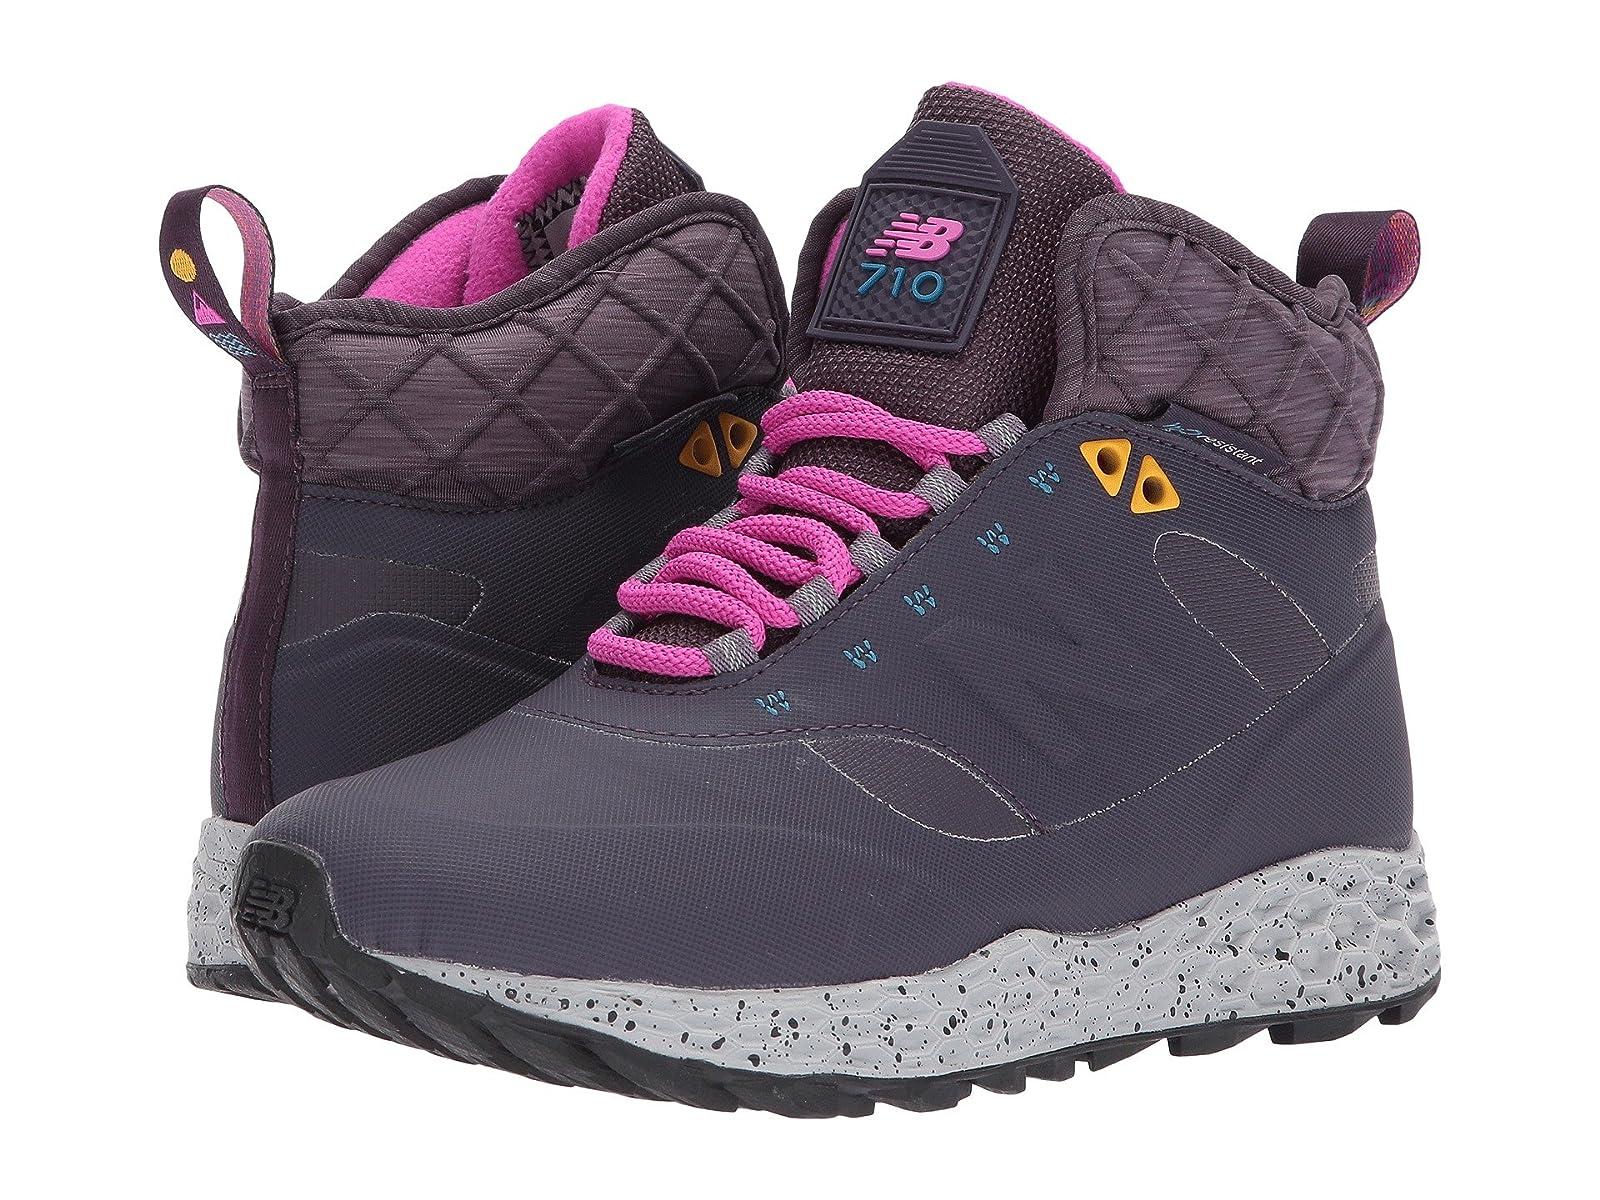 New Balance Classics WVL710v2Cheap and distinctive eye-catching shoes